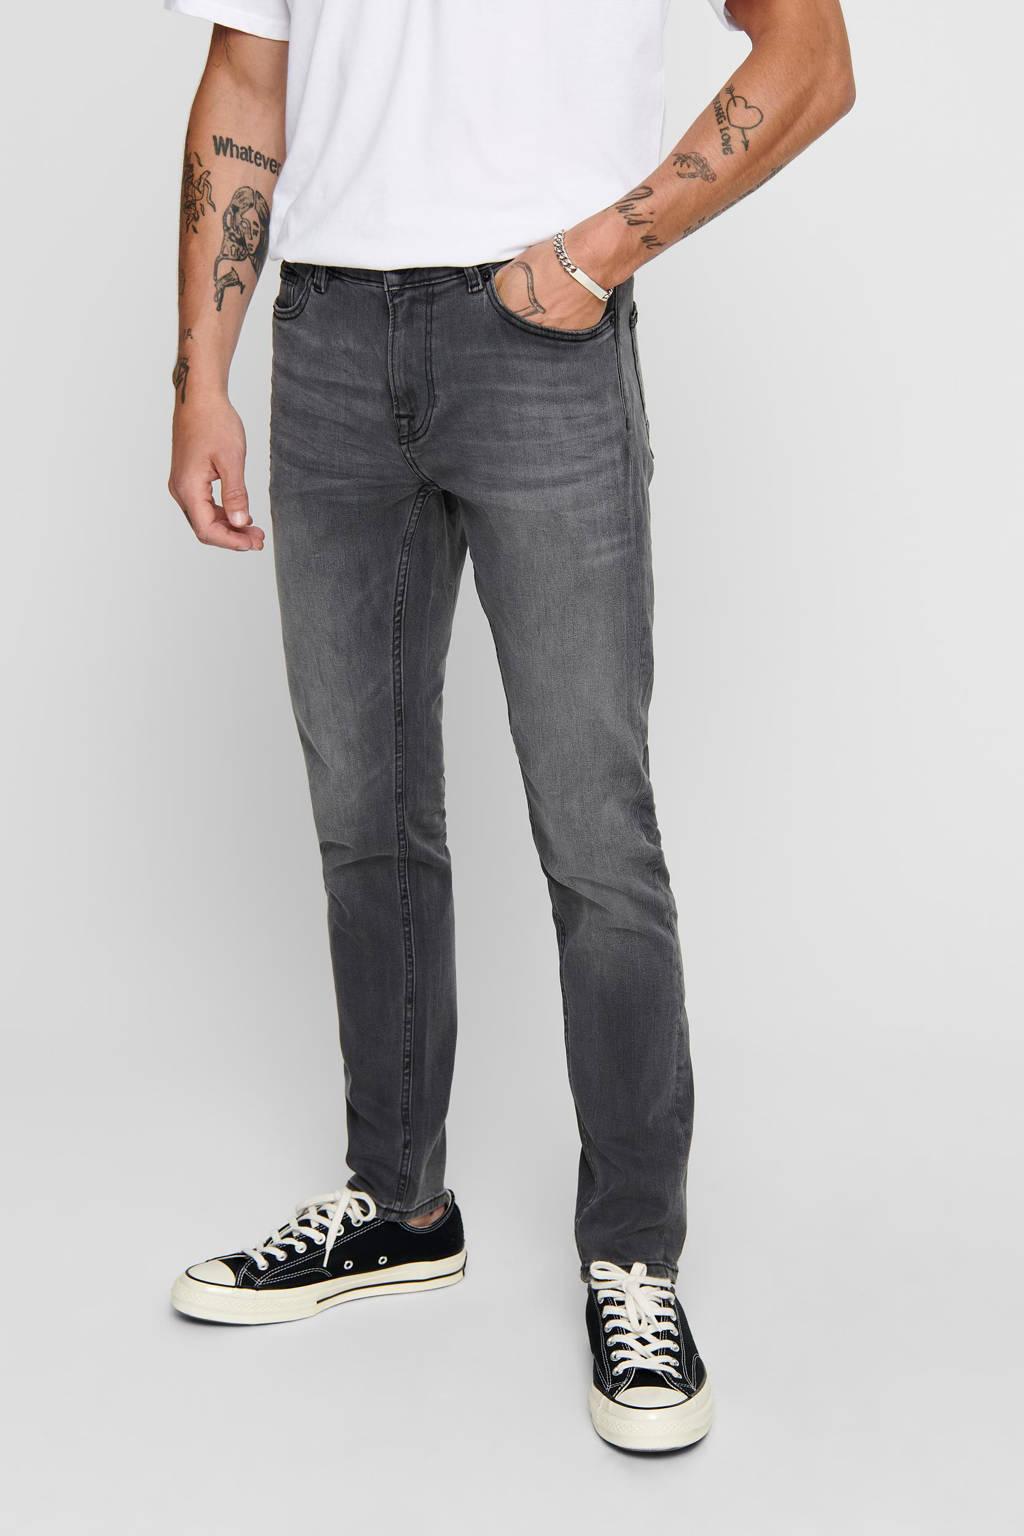 ONLY & SONS skinny jeans grijs, Grijs